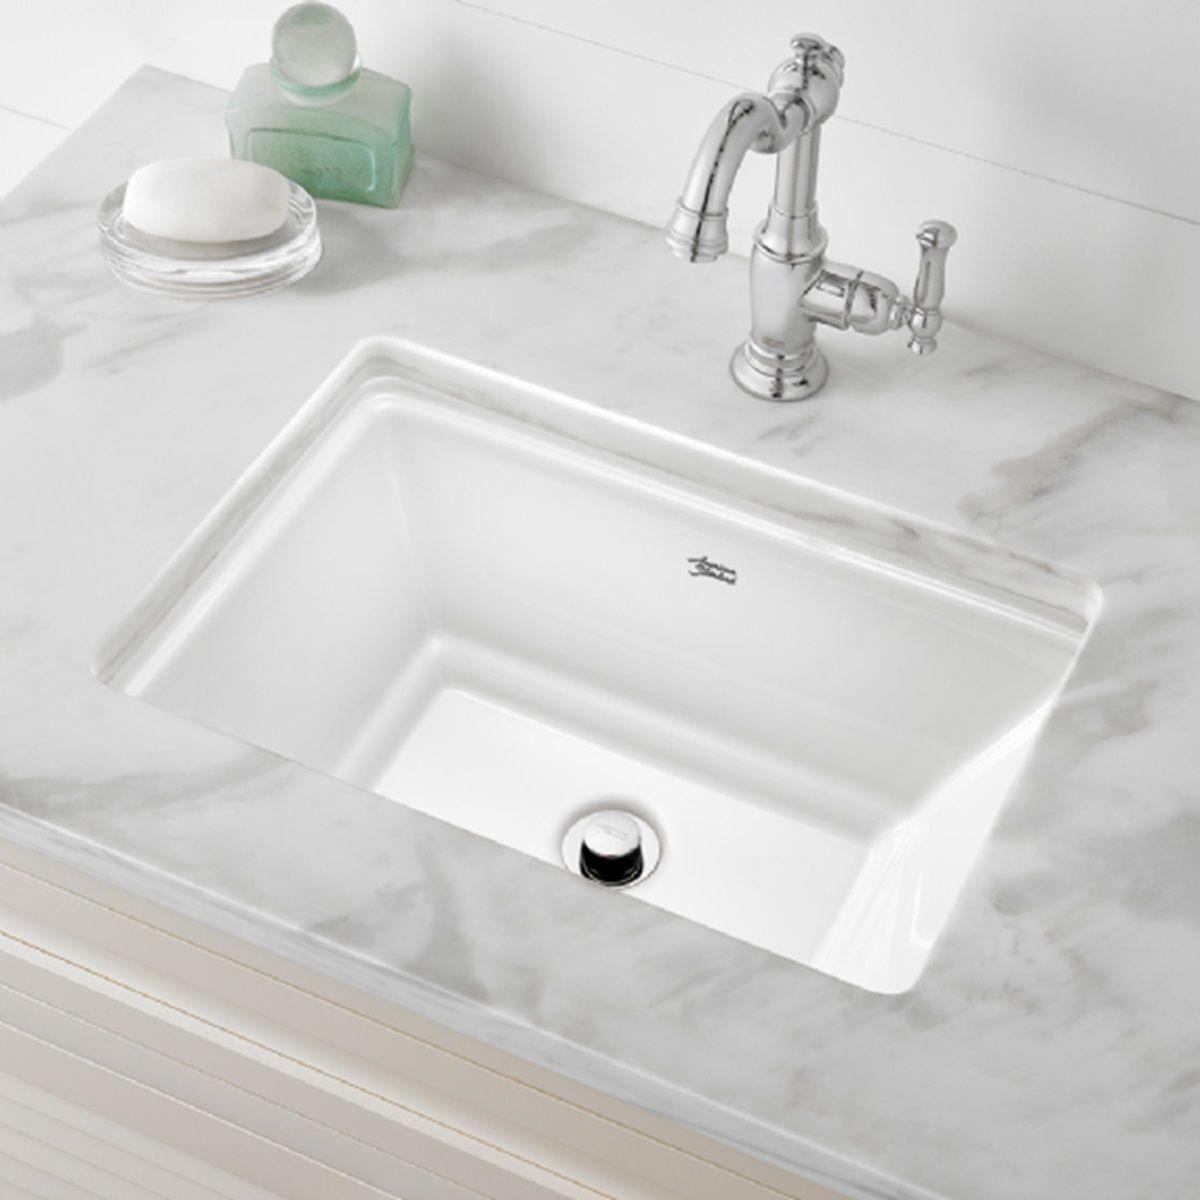 American Standard Under Counter Sink 0483600 020 Rectangular